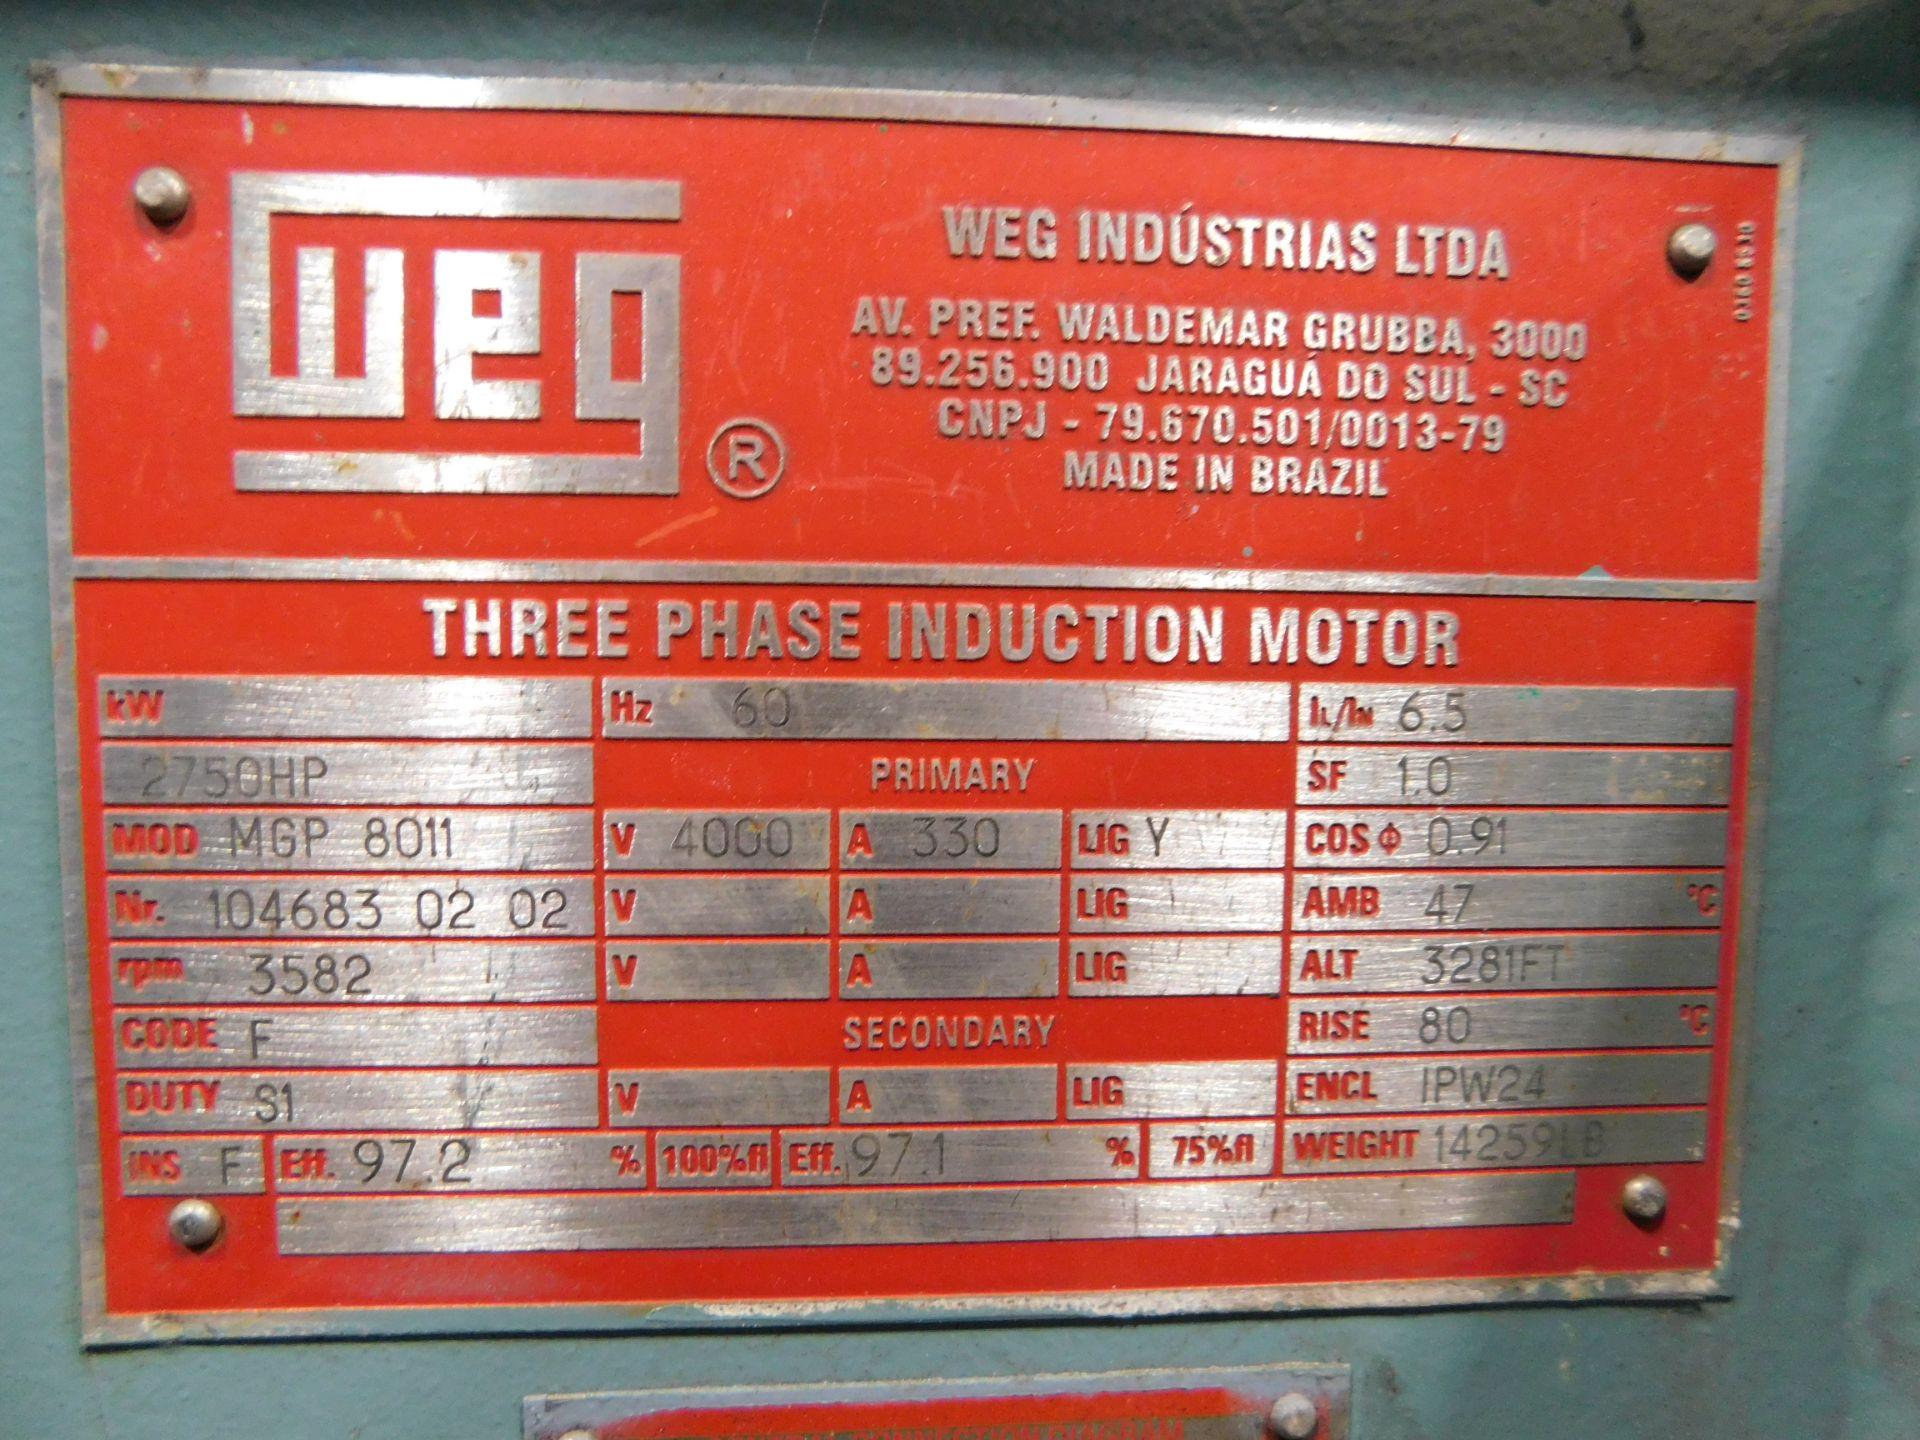 Weg Induction Motor. 2750 HP. 3 Ph. 4000 V. 3582 RPM. 1PW24. MGP 8011. 60 Hz. - Image 5 of 7